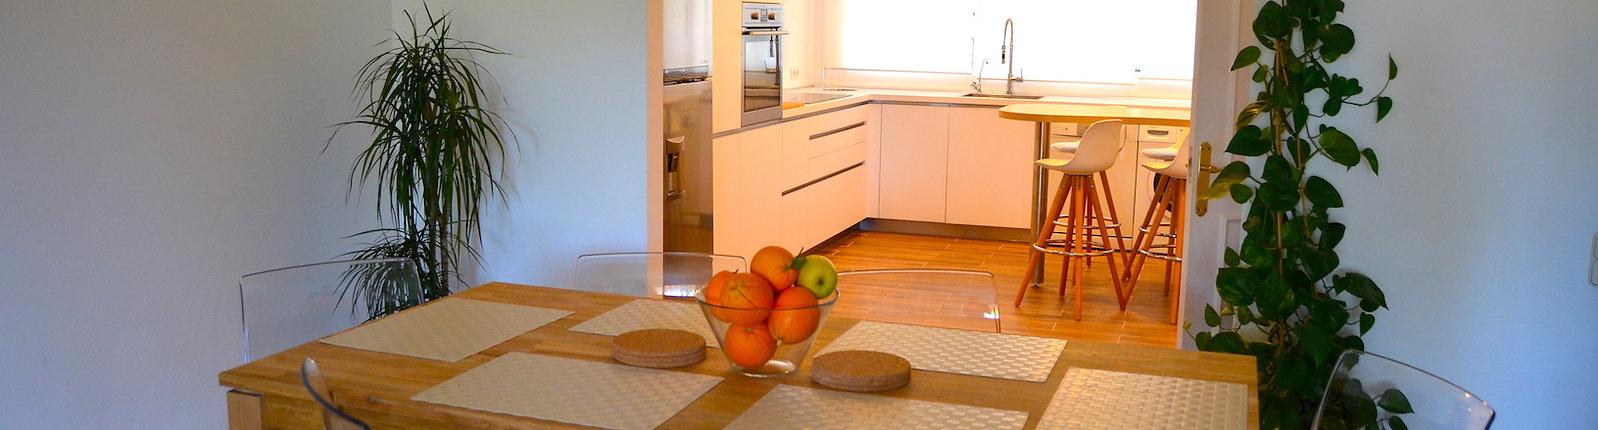 kuchyna 2.JPG